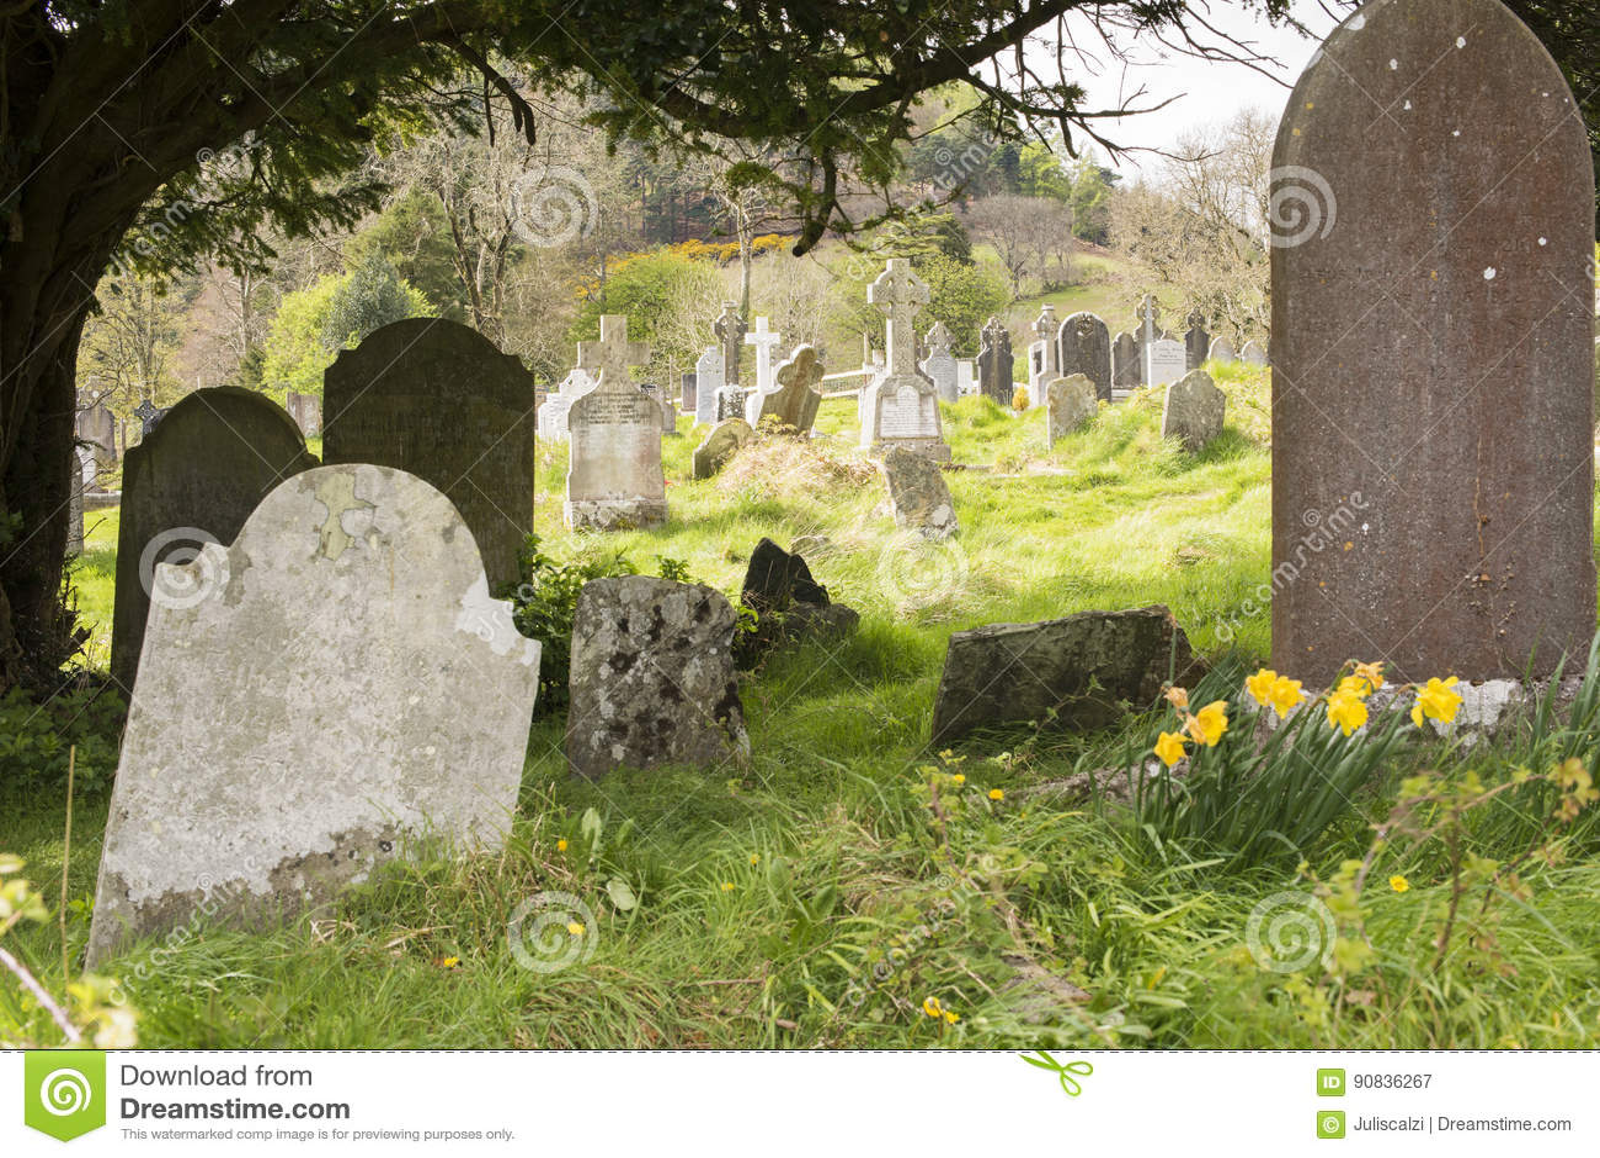 Magherafelt cemetery search